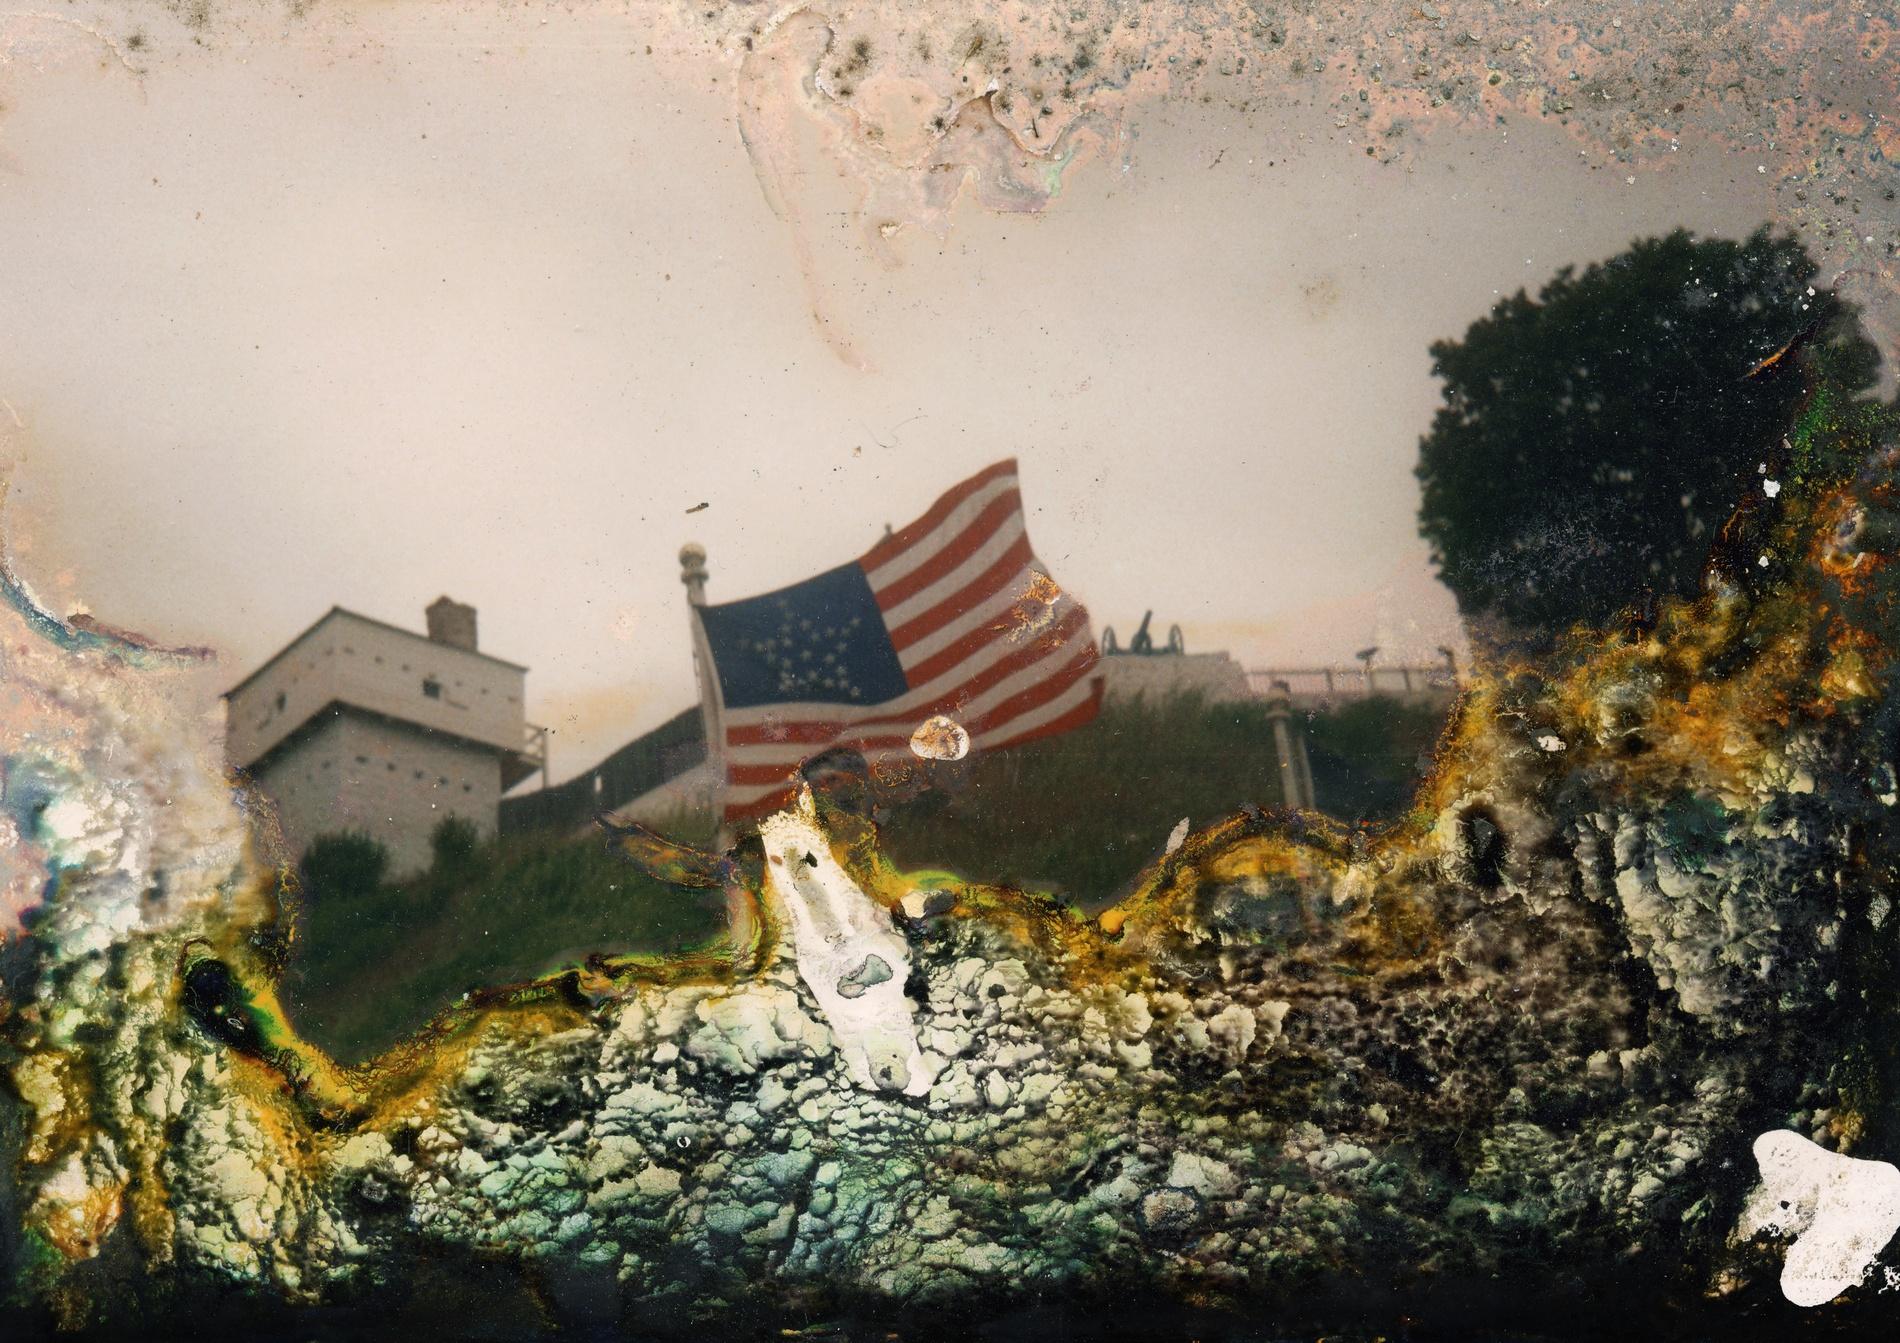 Arianna Arcara, Luca Santese Collection Found Photos in Detroit (źródło: materiały prasowe organizatora)